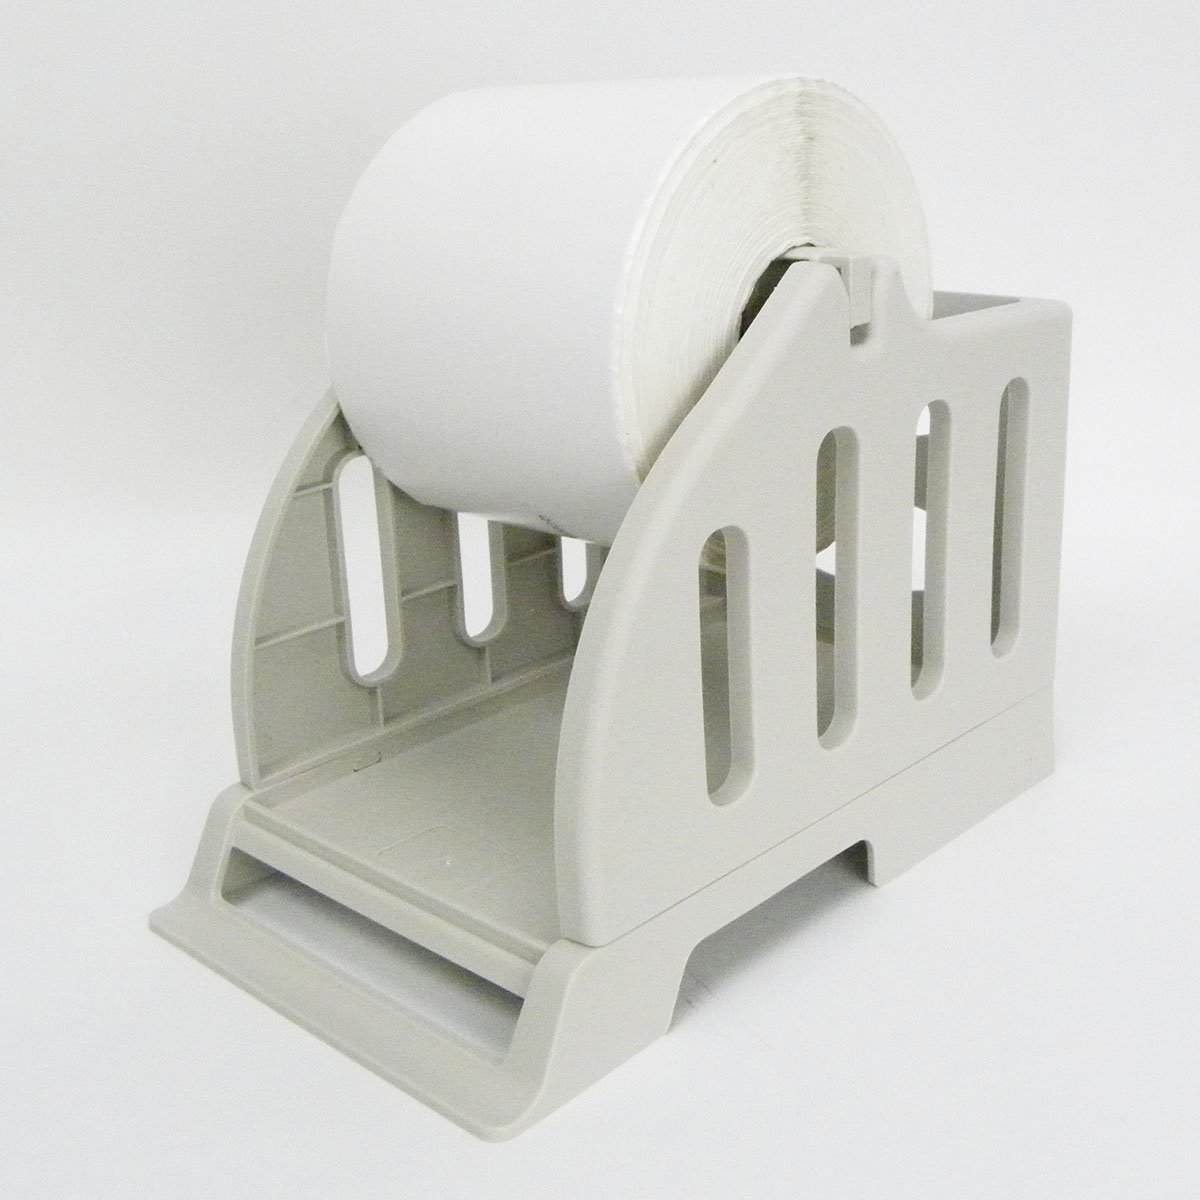 Thermal Label Holder for Rolls and Fan-Fold Labels Great for Desktop Thermal Printers Label Holder